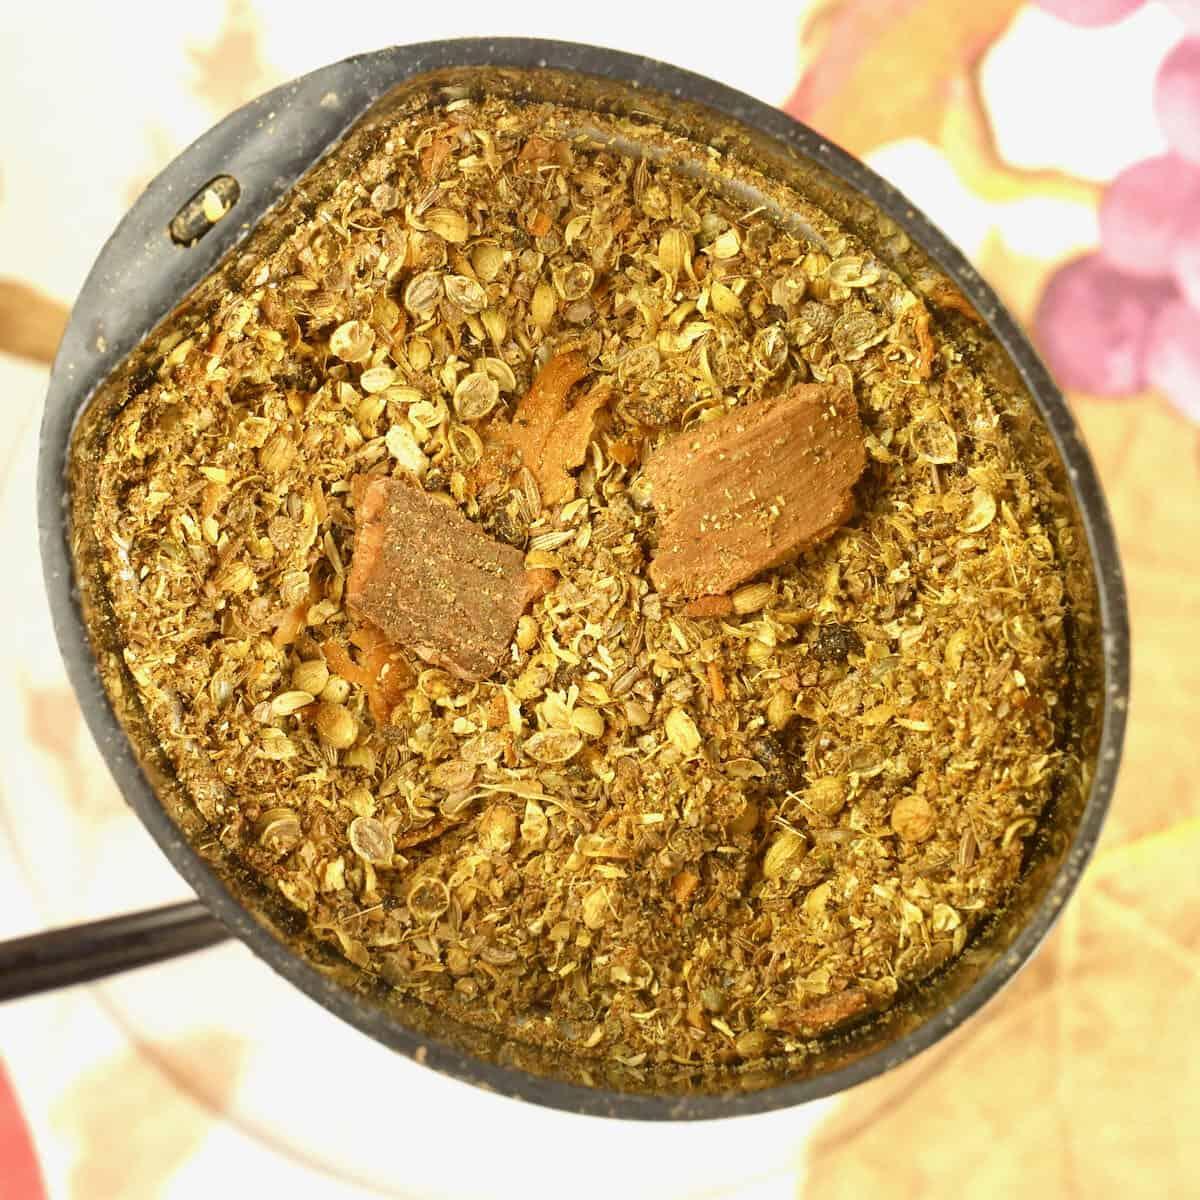 Grind the whole spice for the tandoori masala powder.